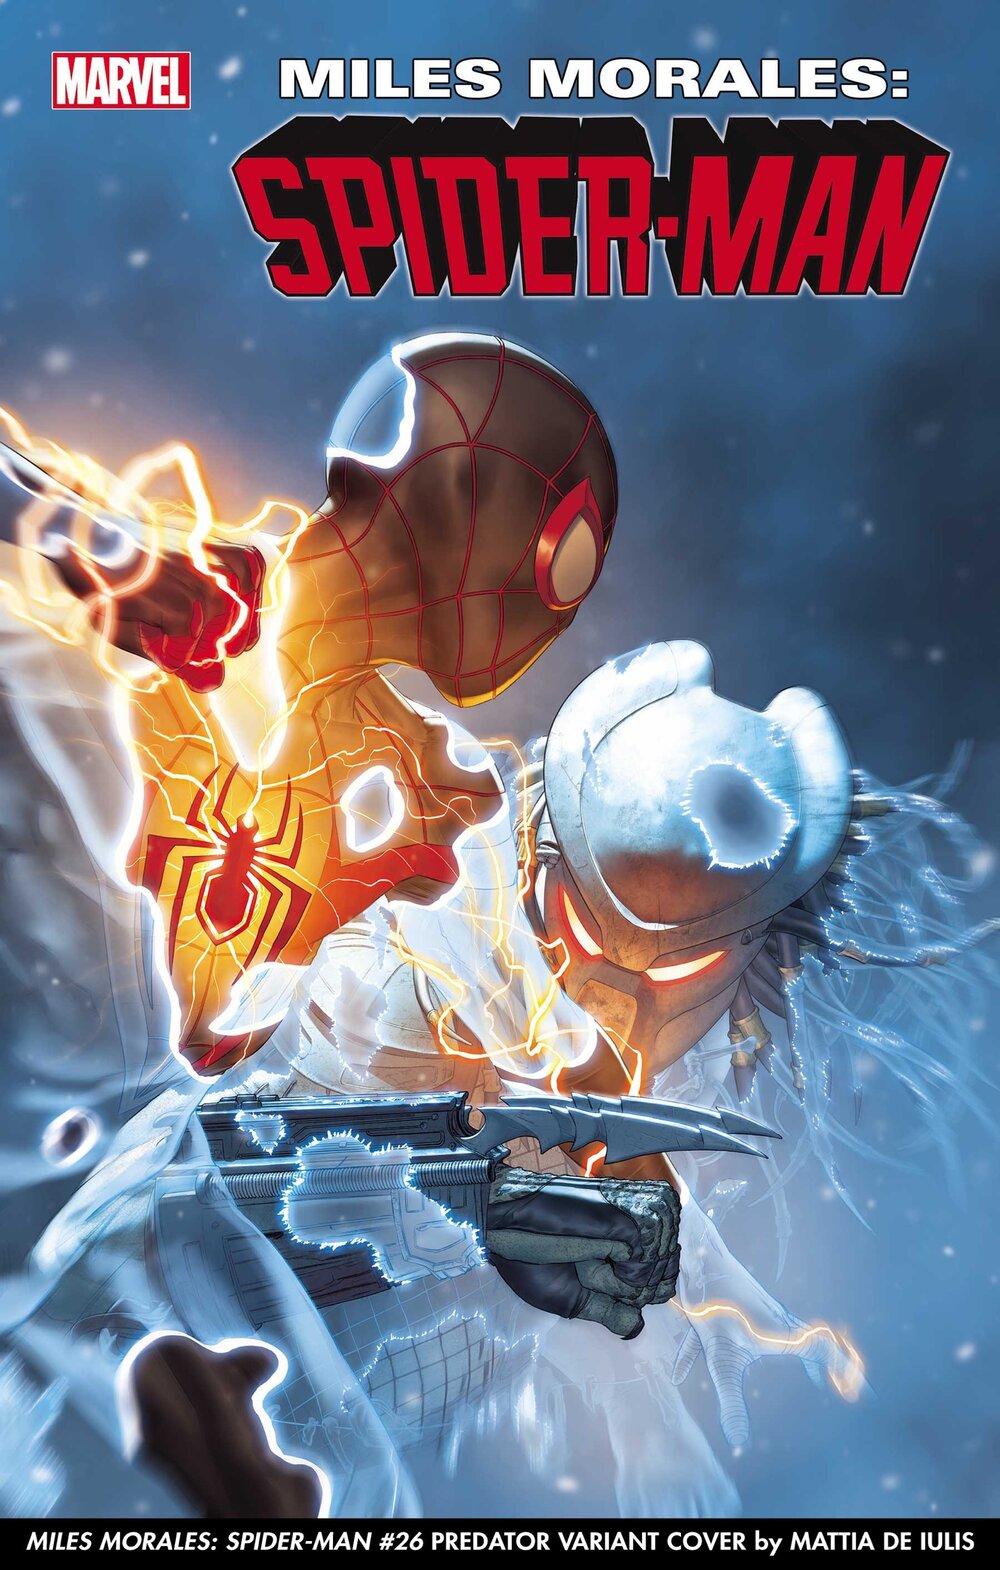 MILES MORALES: SPIDER-MAN #26 PREDATOR VARIANT COVER by MATTIA DE IULIS